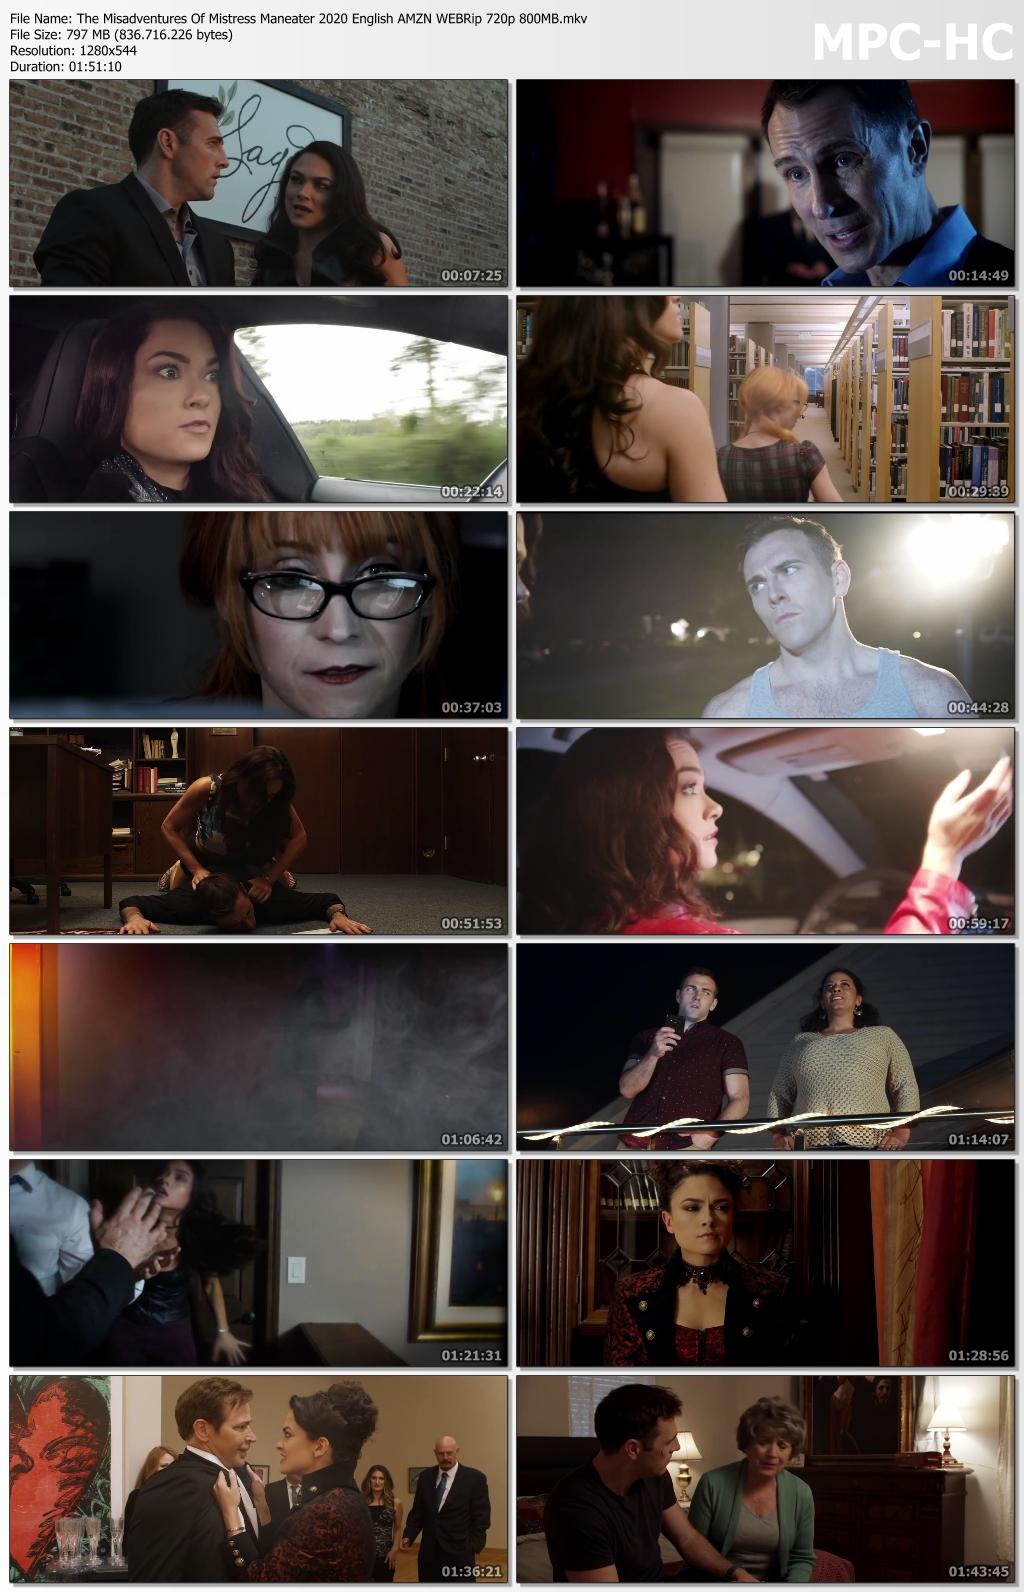 The-Misadventures-Of-Mistress-Maneater-2020-English-AMZN-WEBRip-720p-800-MB-mkv-thumbs